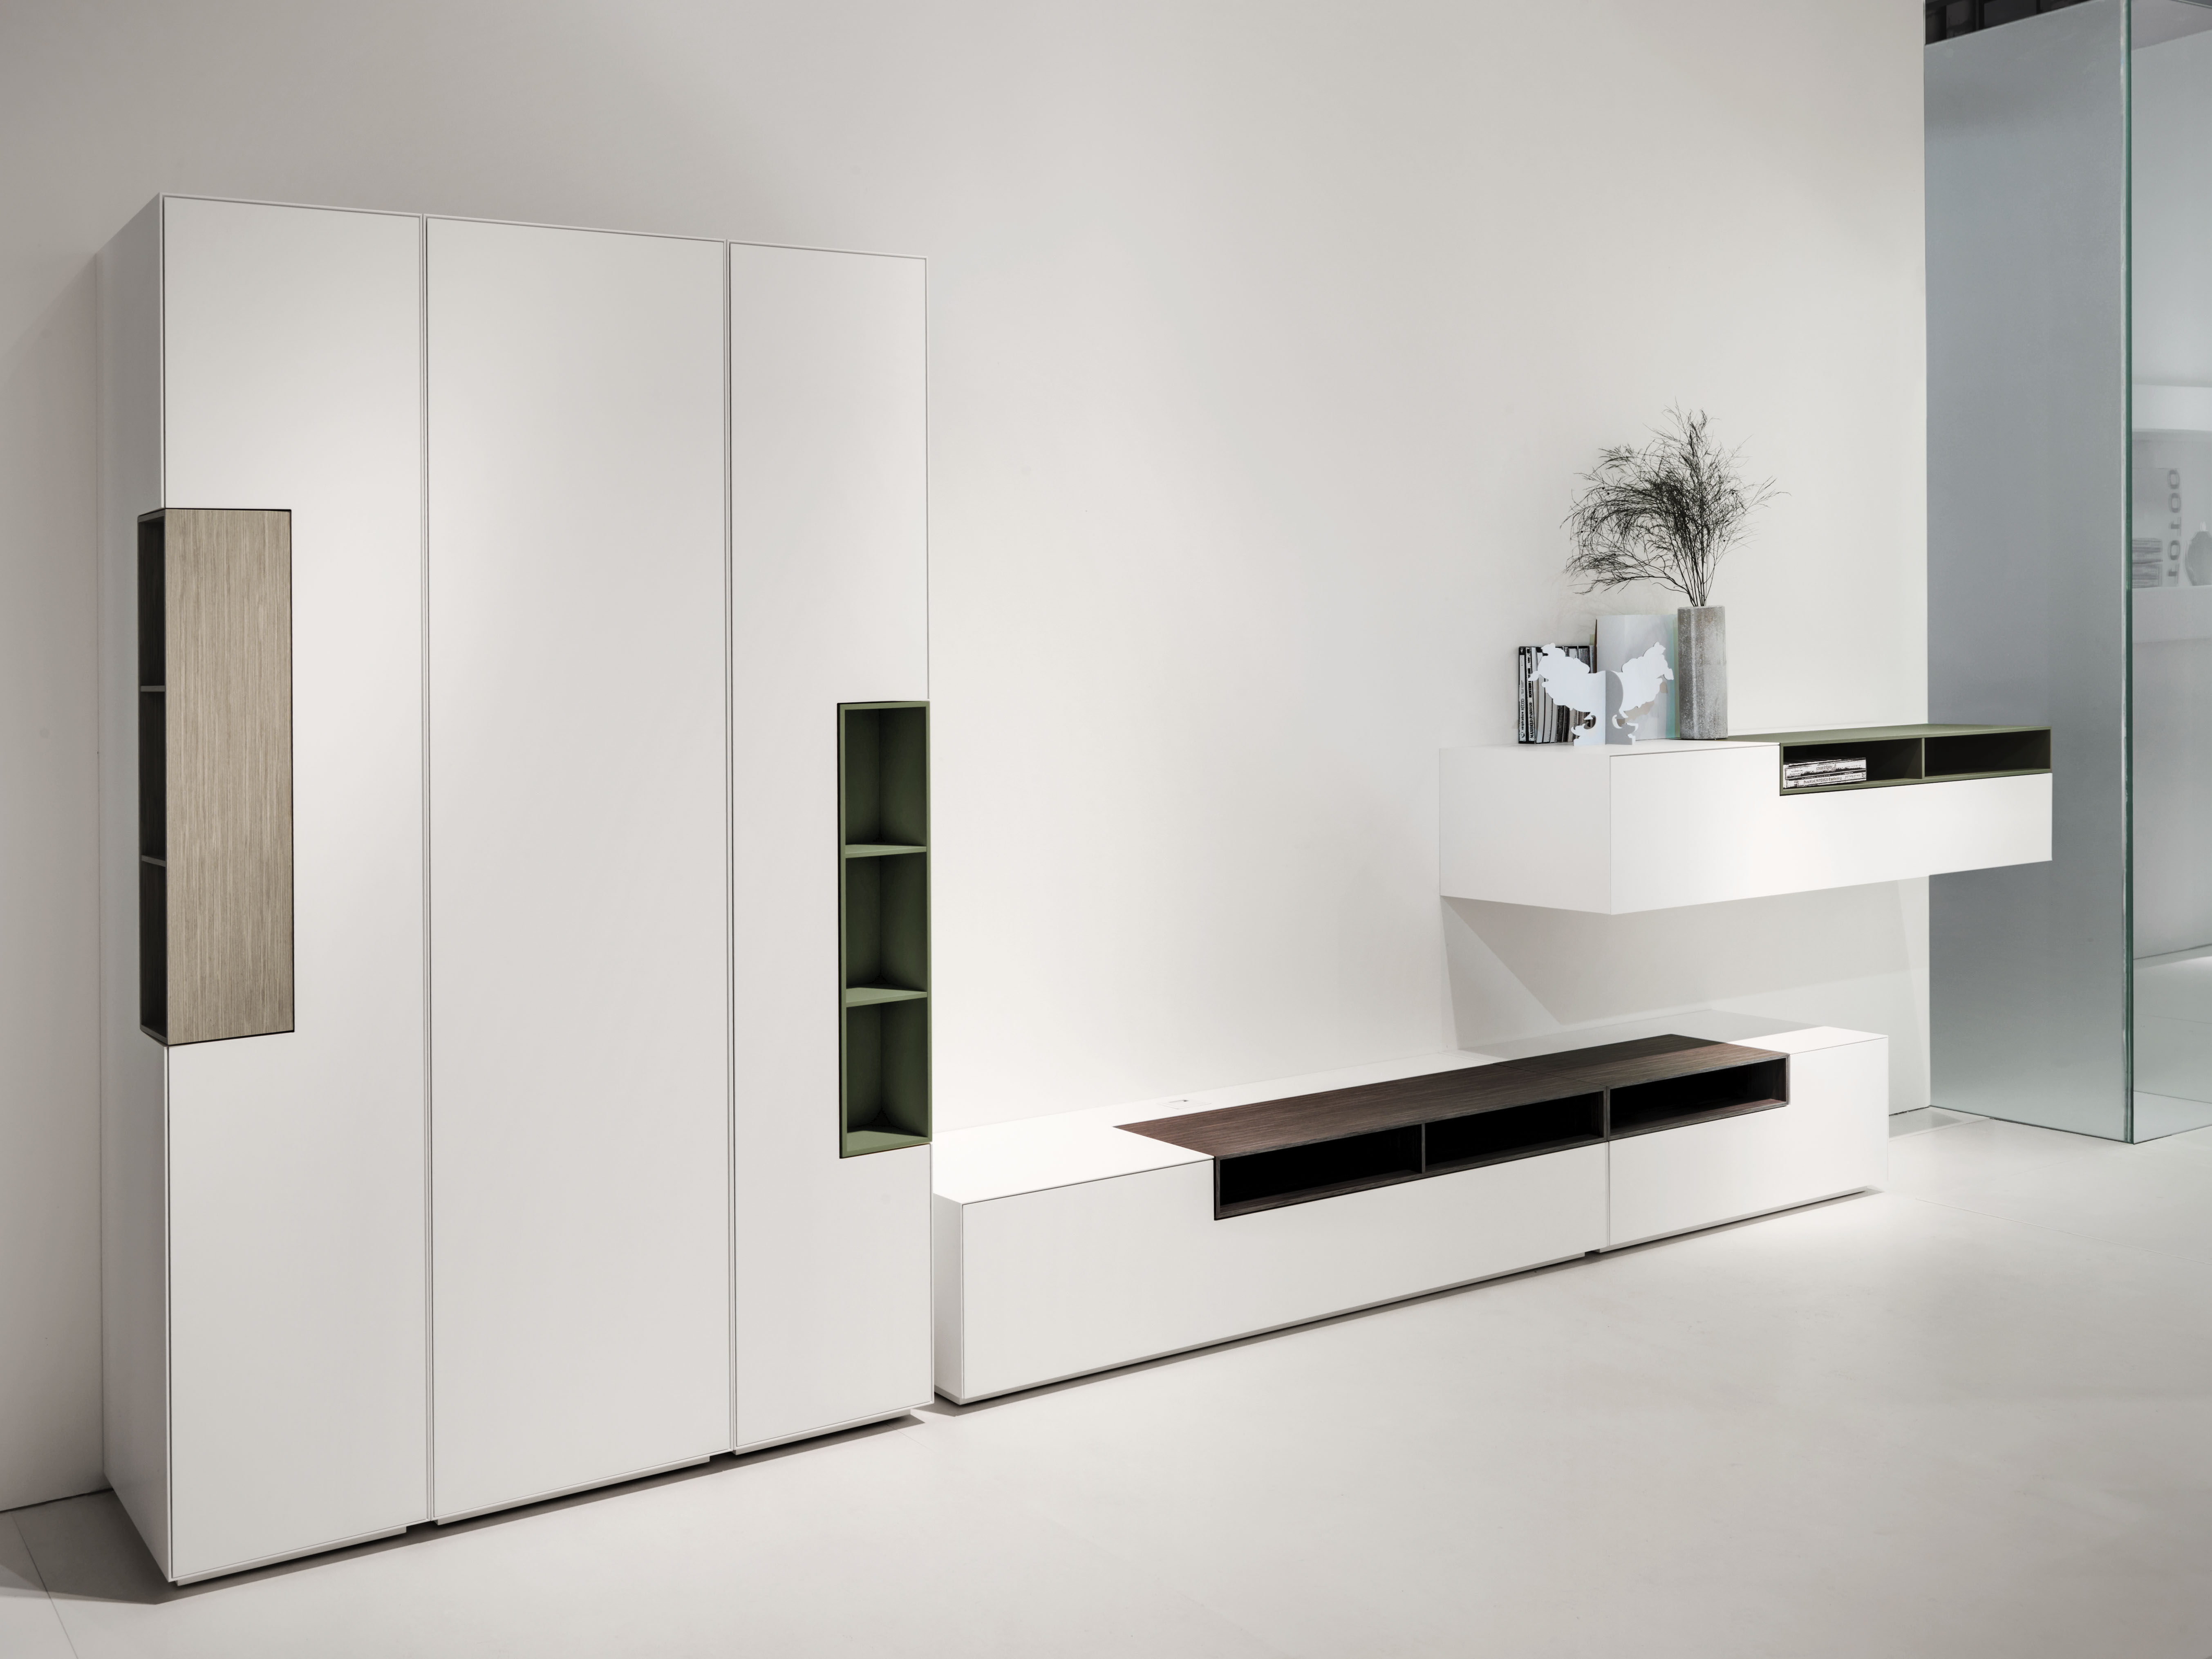 Inmotion storage column 3 shelves h 188 x w 45 cm h 188 x w 45 cm matt white by mdf italia - Mdf italia ...